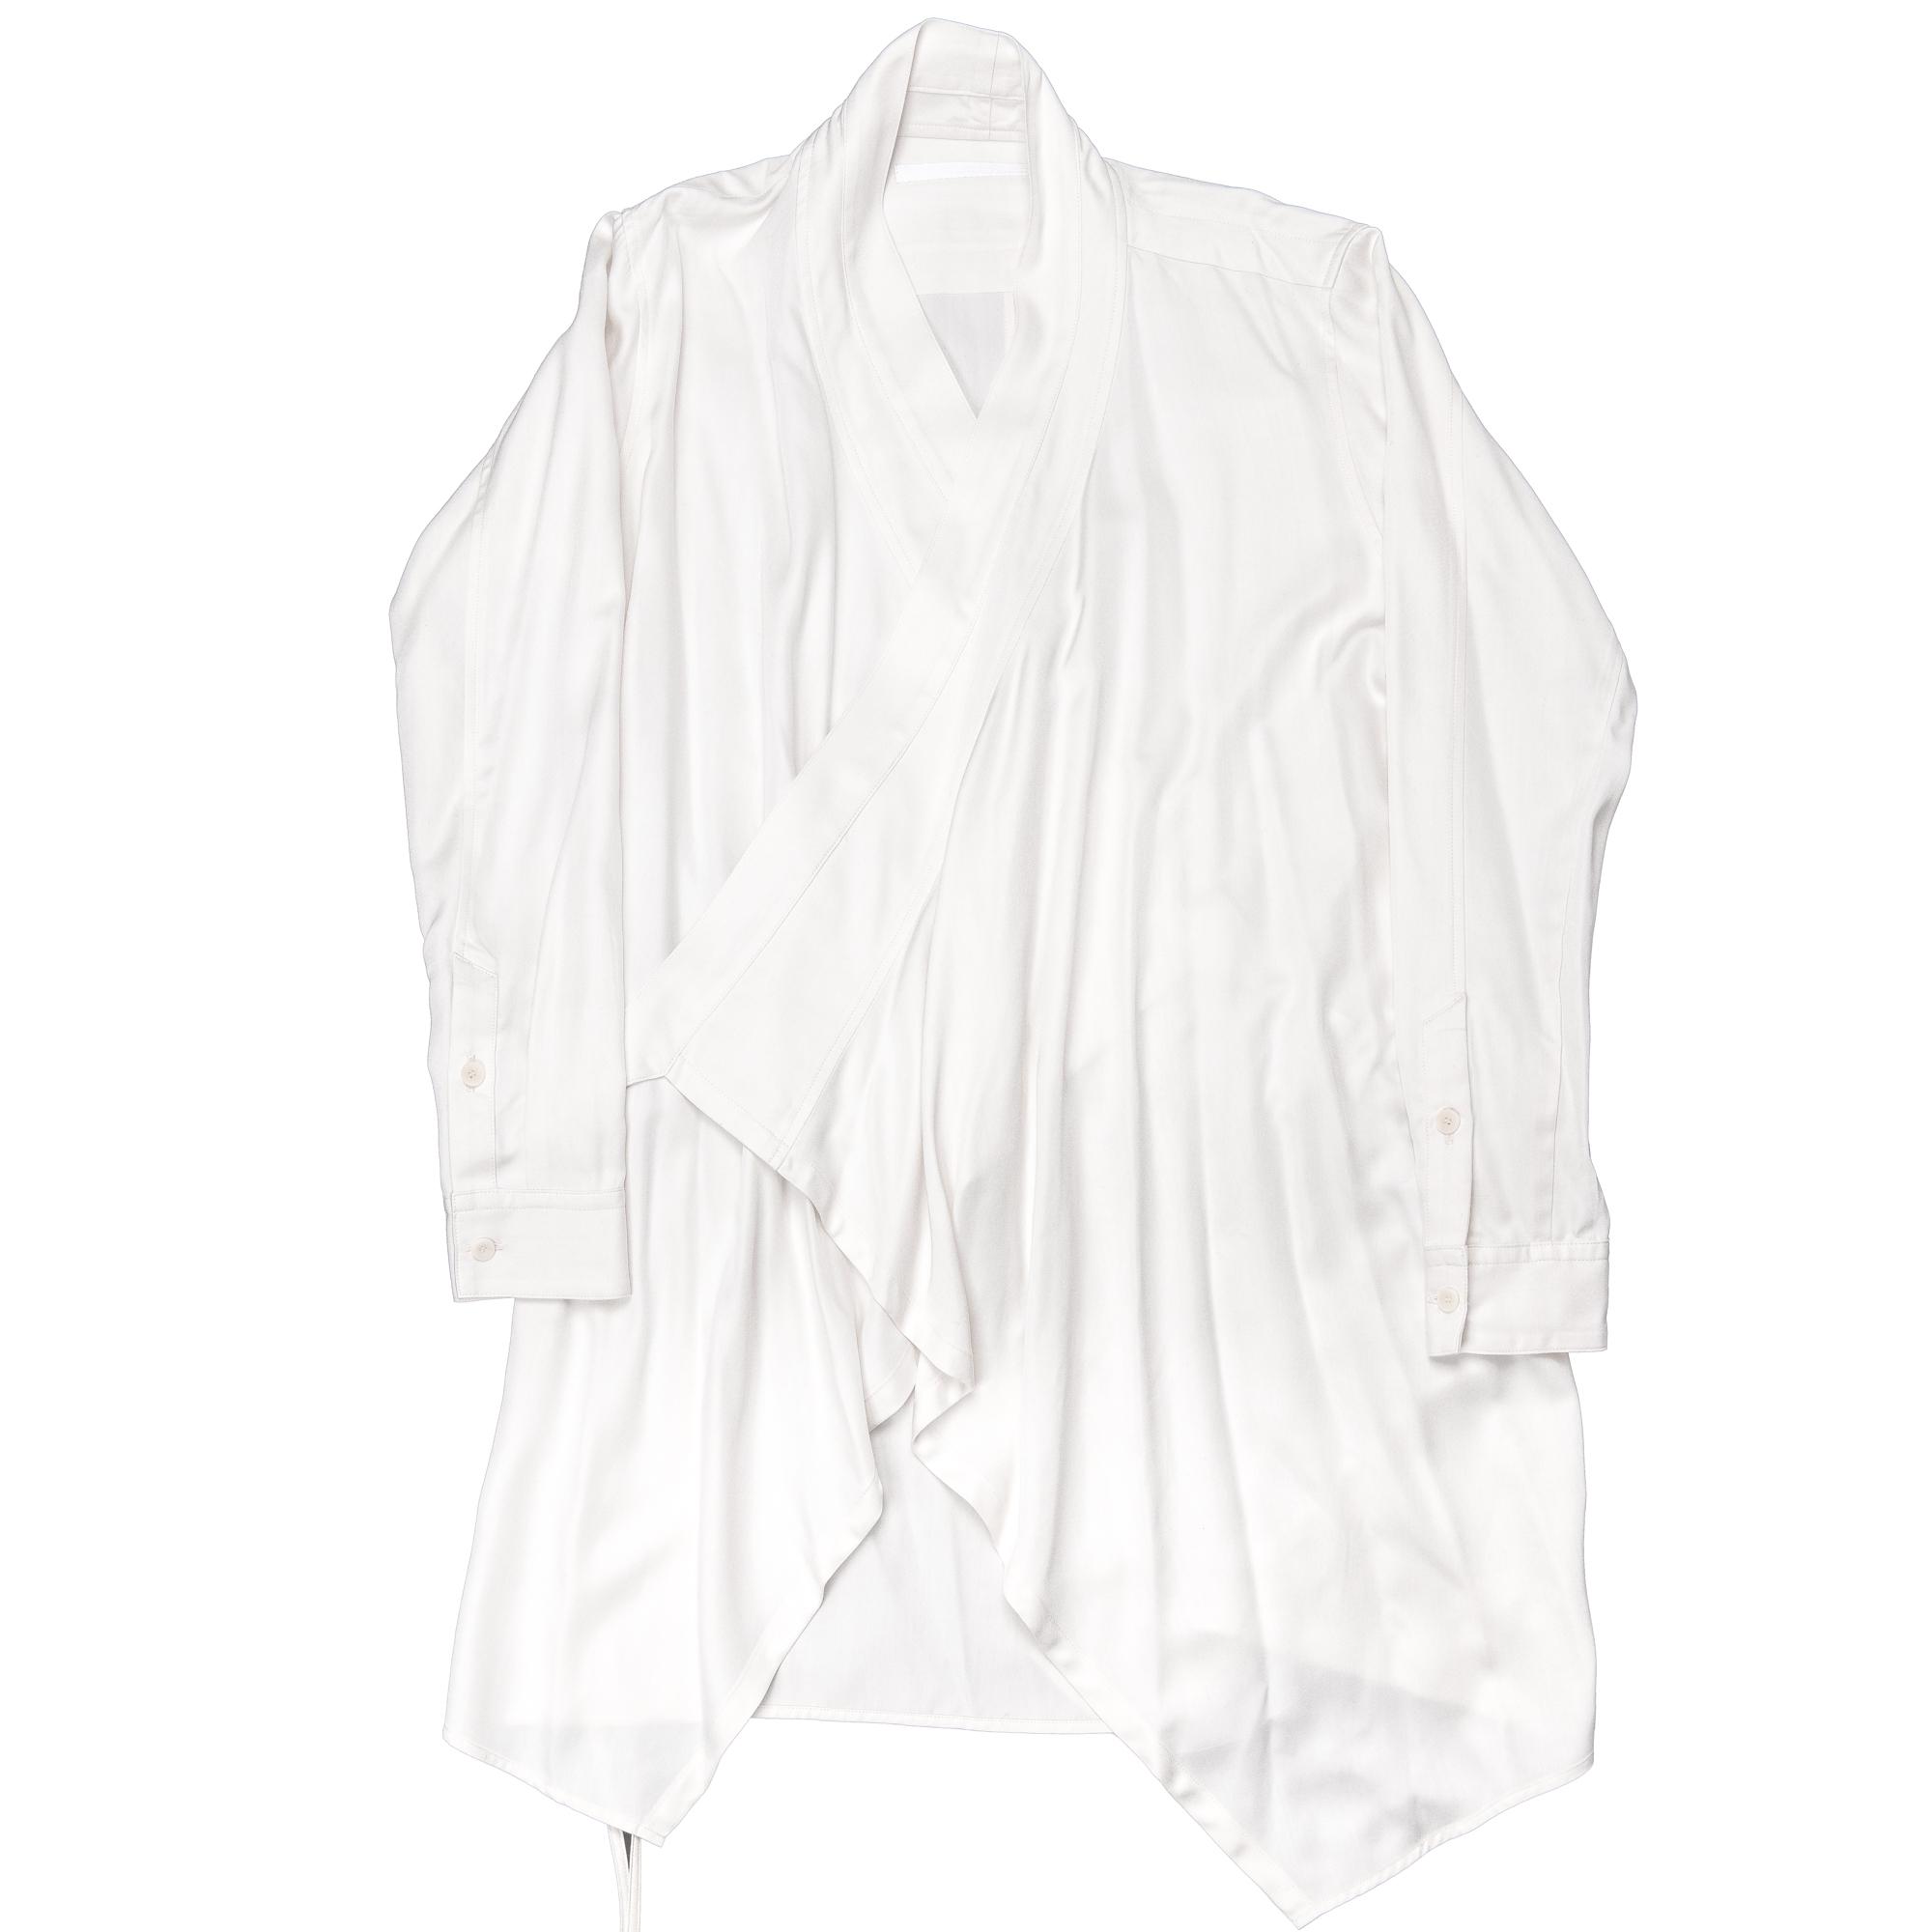 647SHM1-PLASTER / Wラッピングシャツジャケット